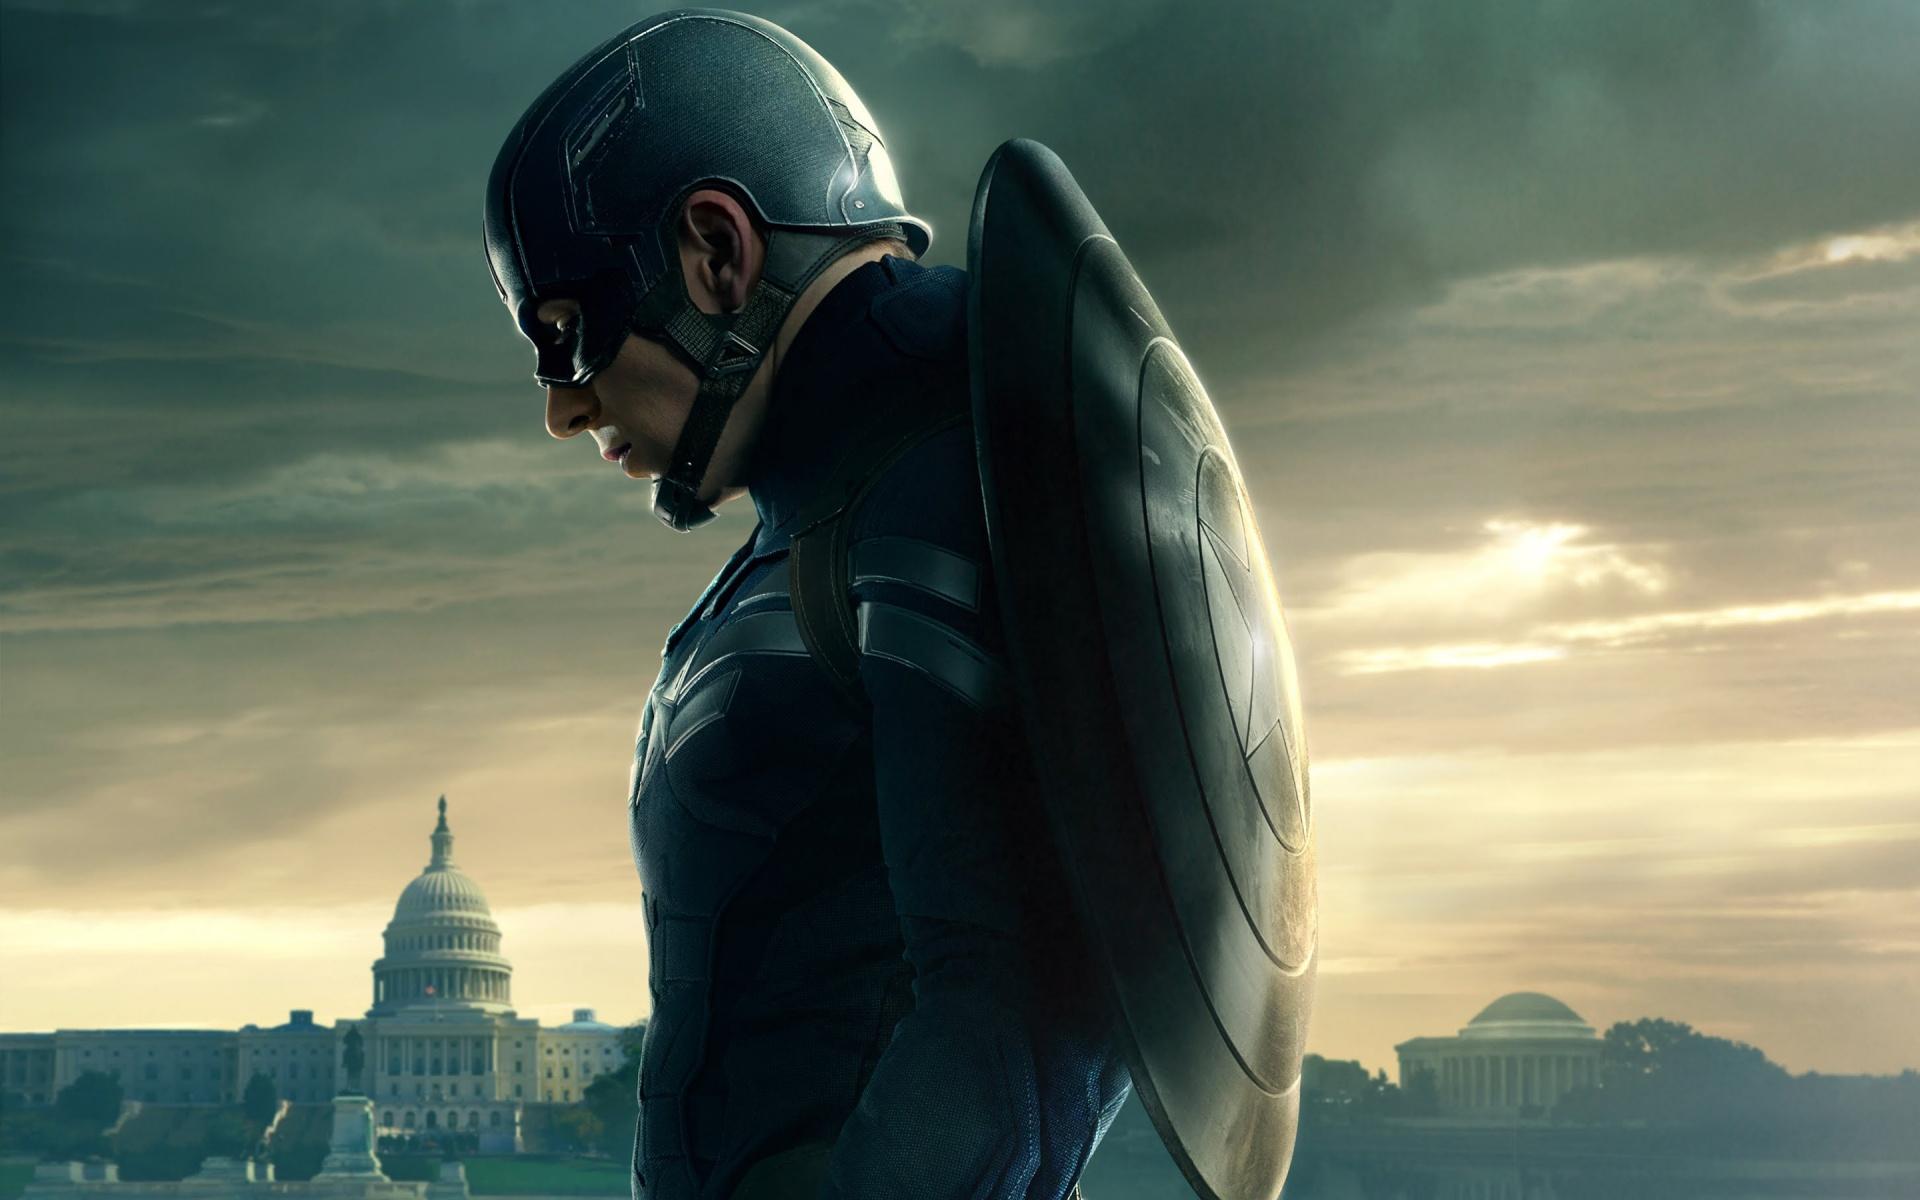 Captain America HD Wallpaper For Desktop 1920x1200